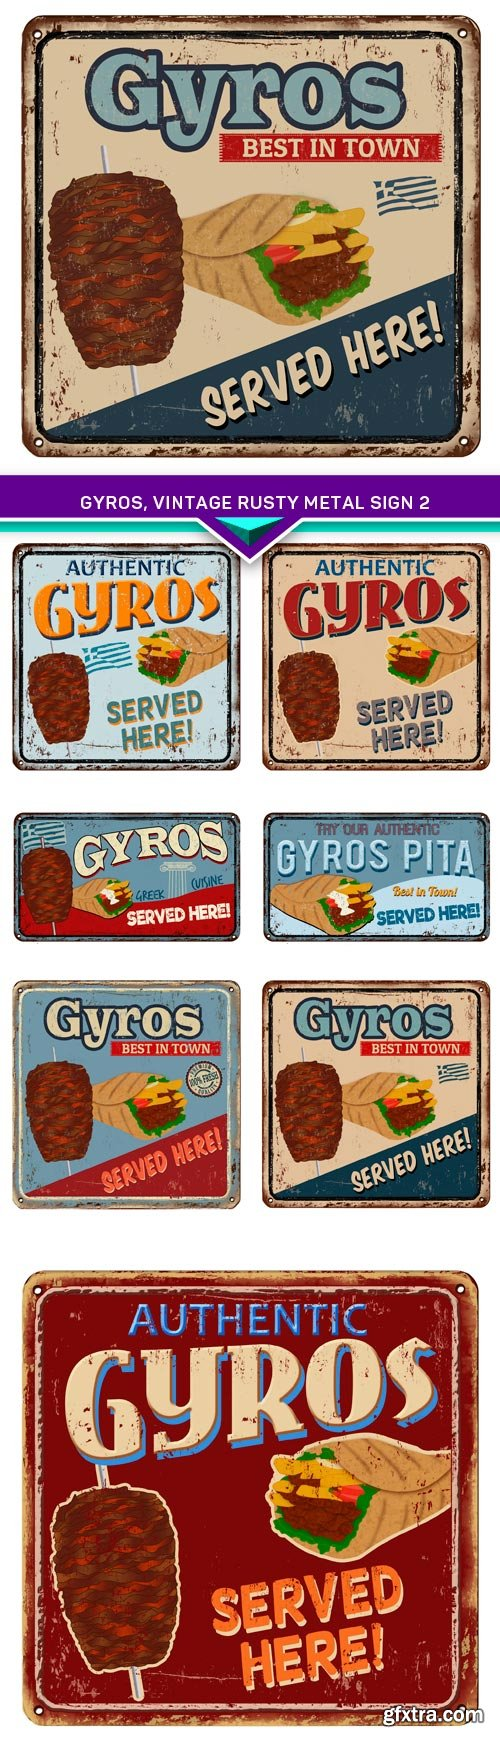 Gyros, vintage rusty metal sign 2 7x EPS